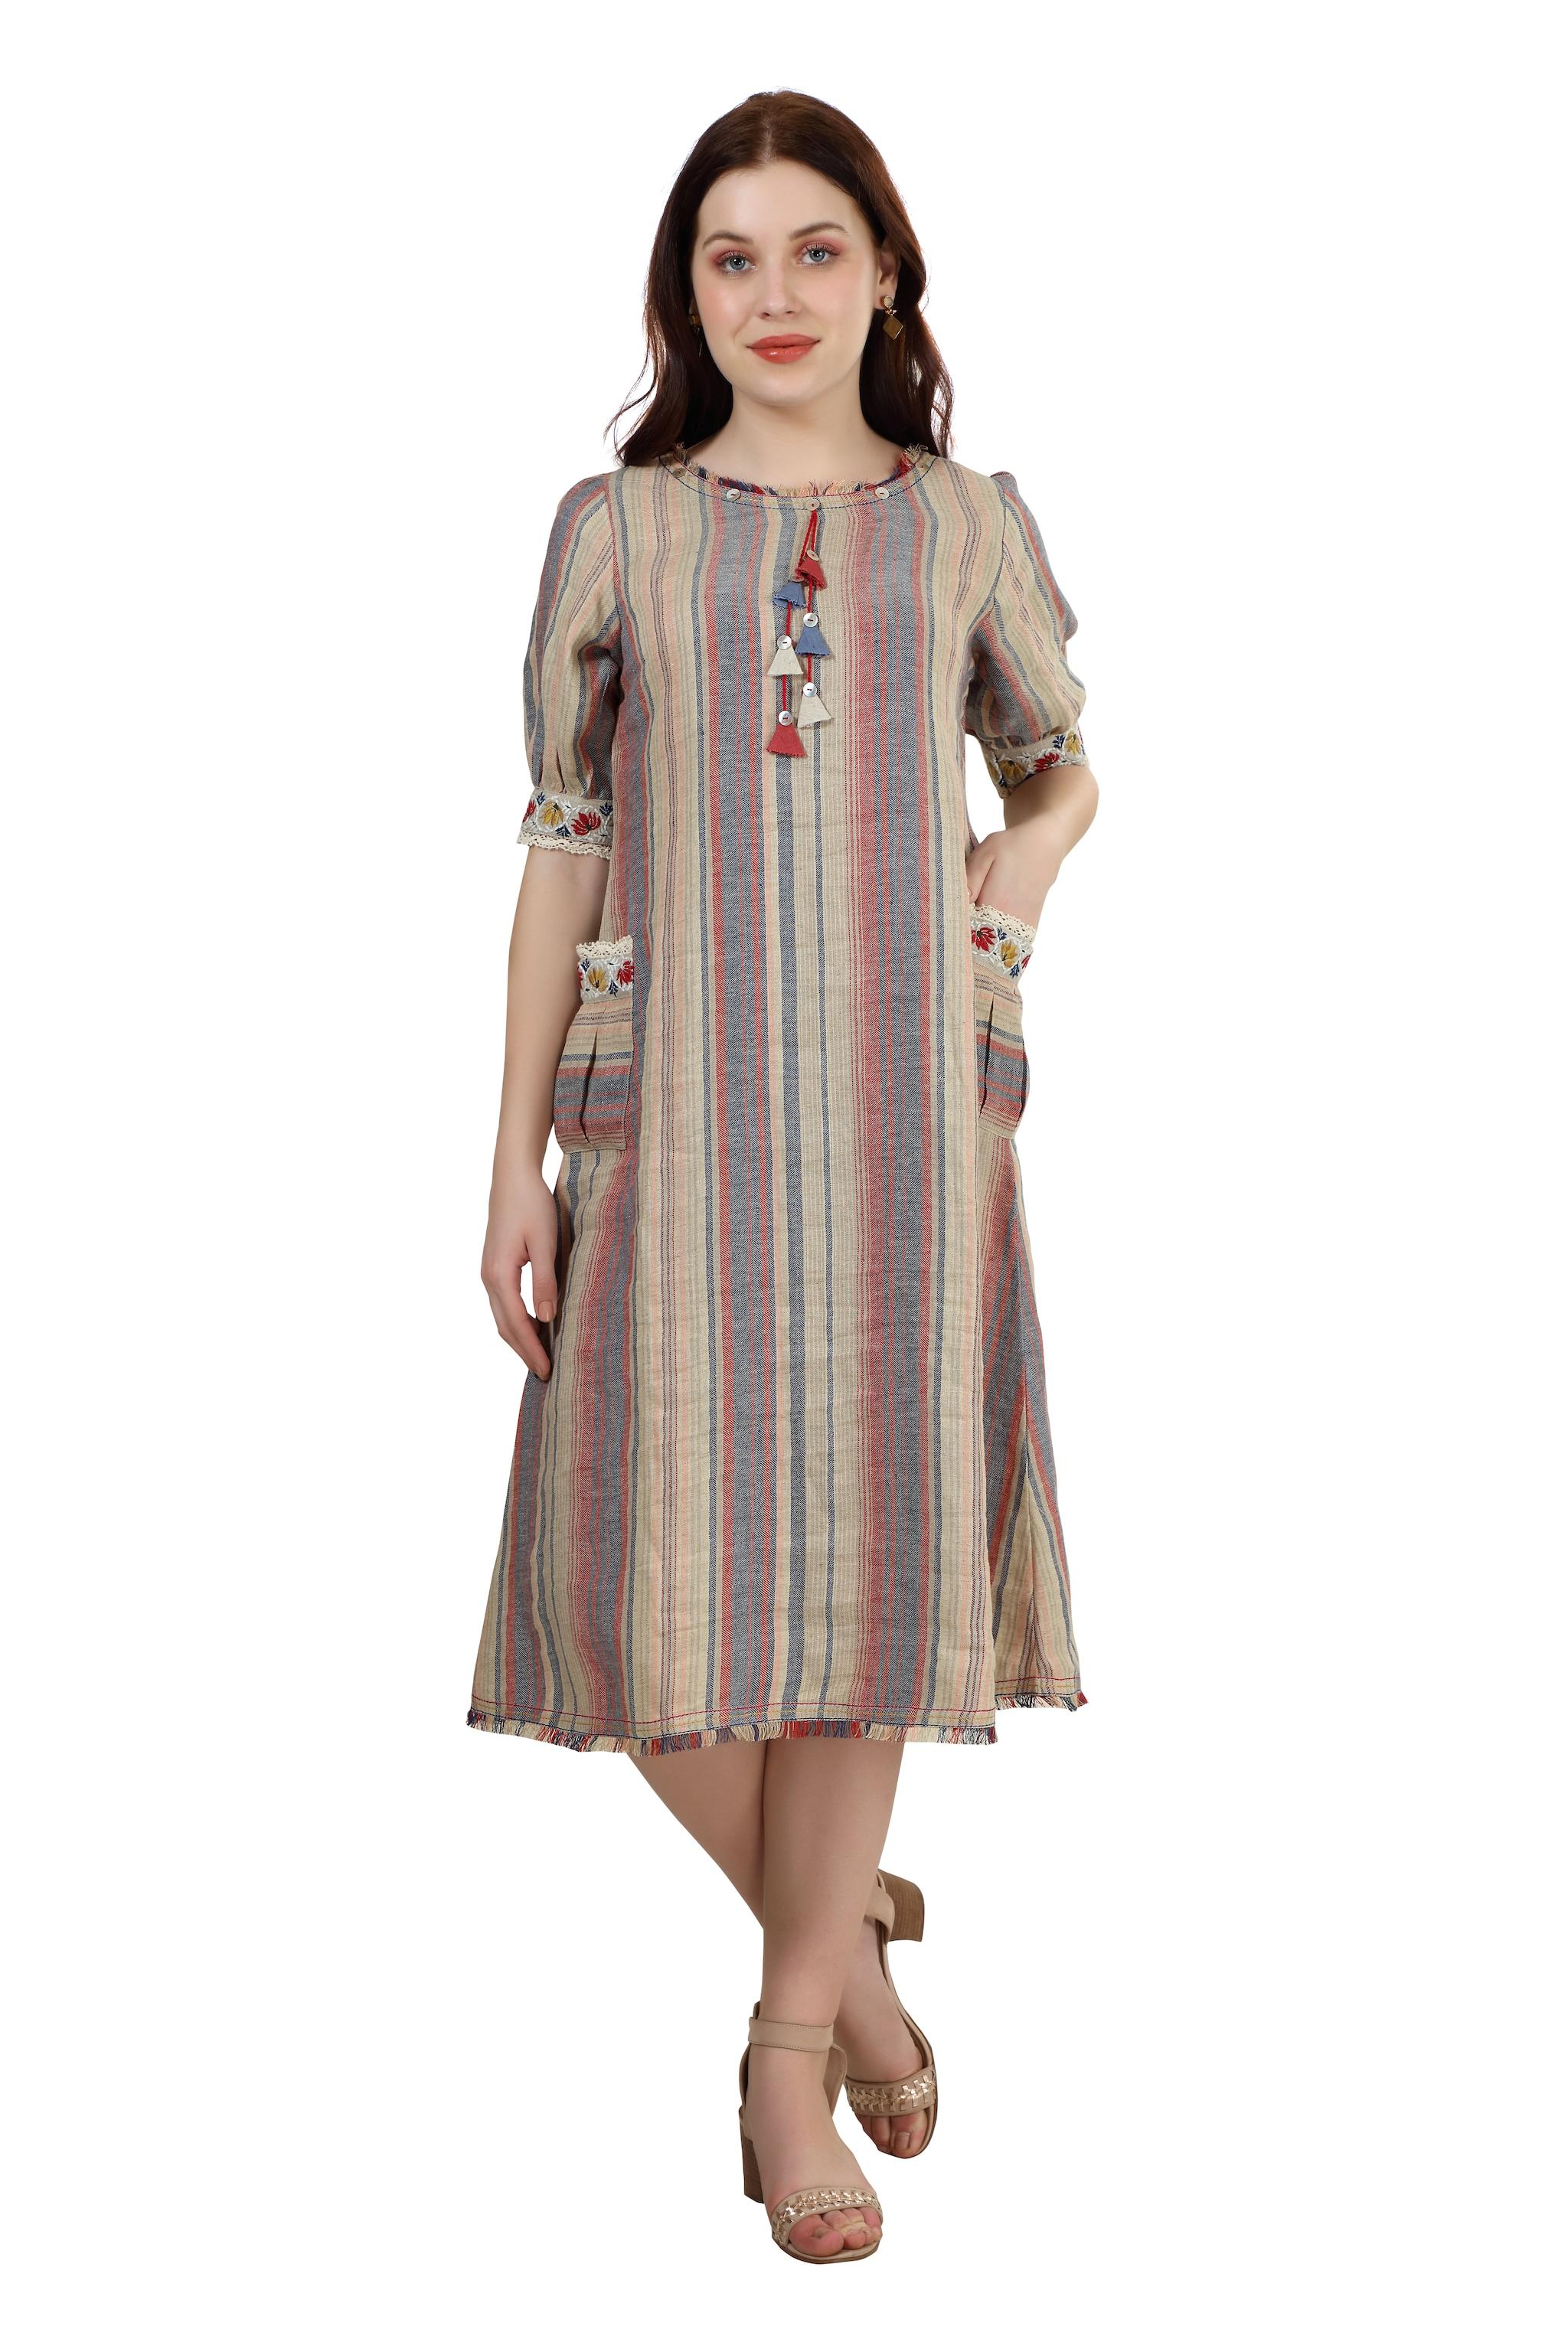 202029 Berry Woven Stripe Twin Pocket Linen Dress (XS,Berry)